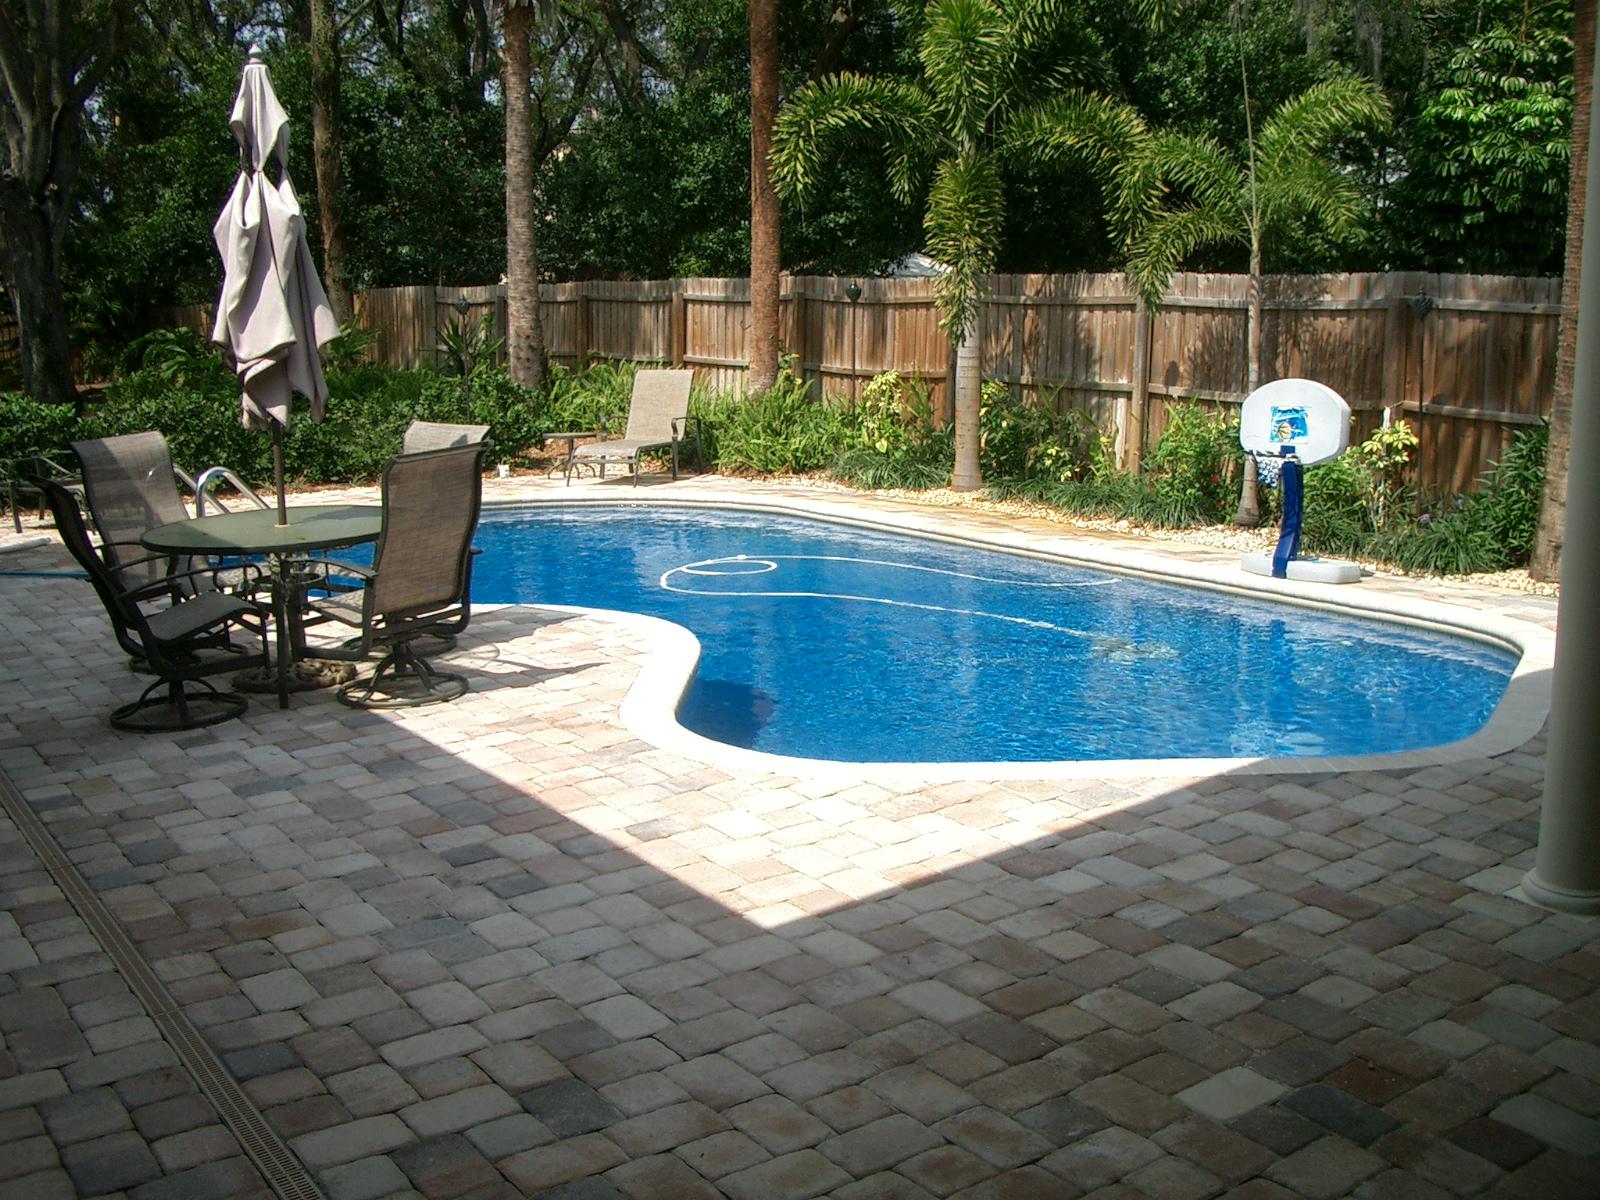 backyard swimming pool ideas photo - 1